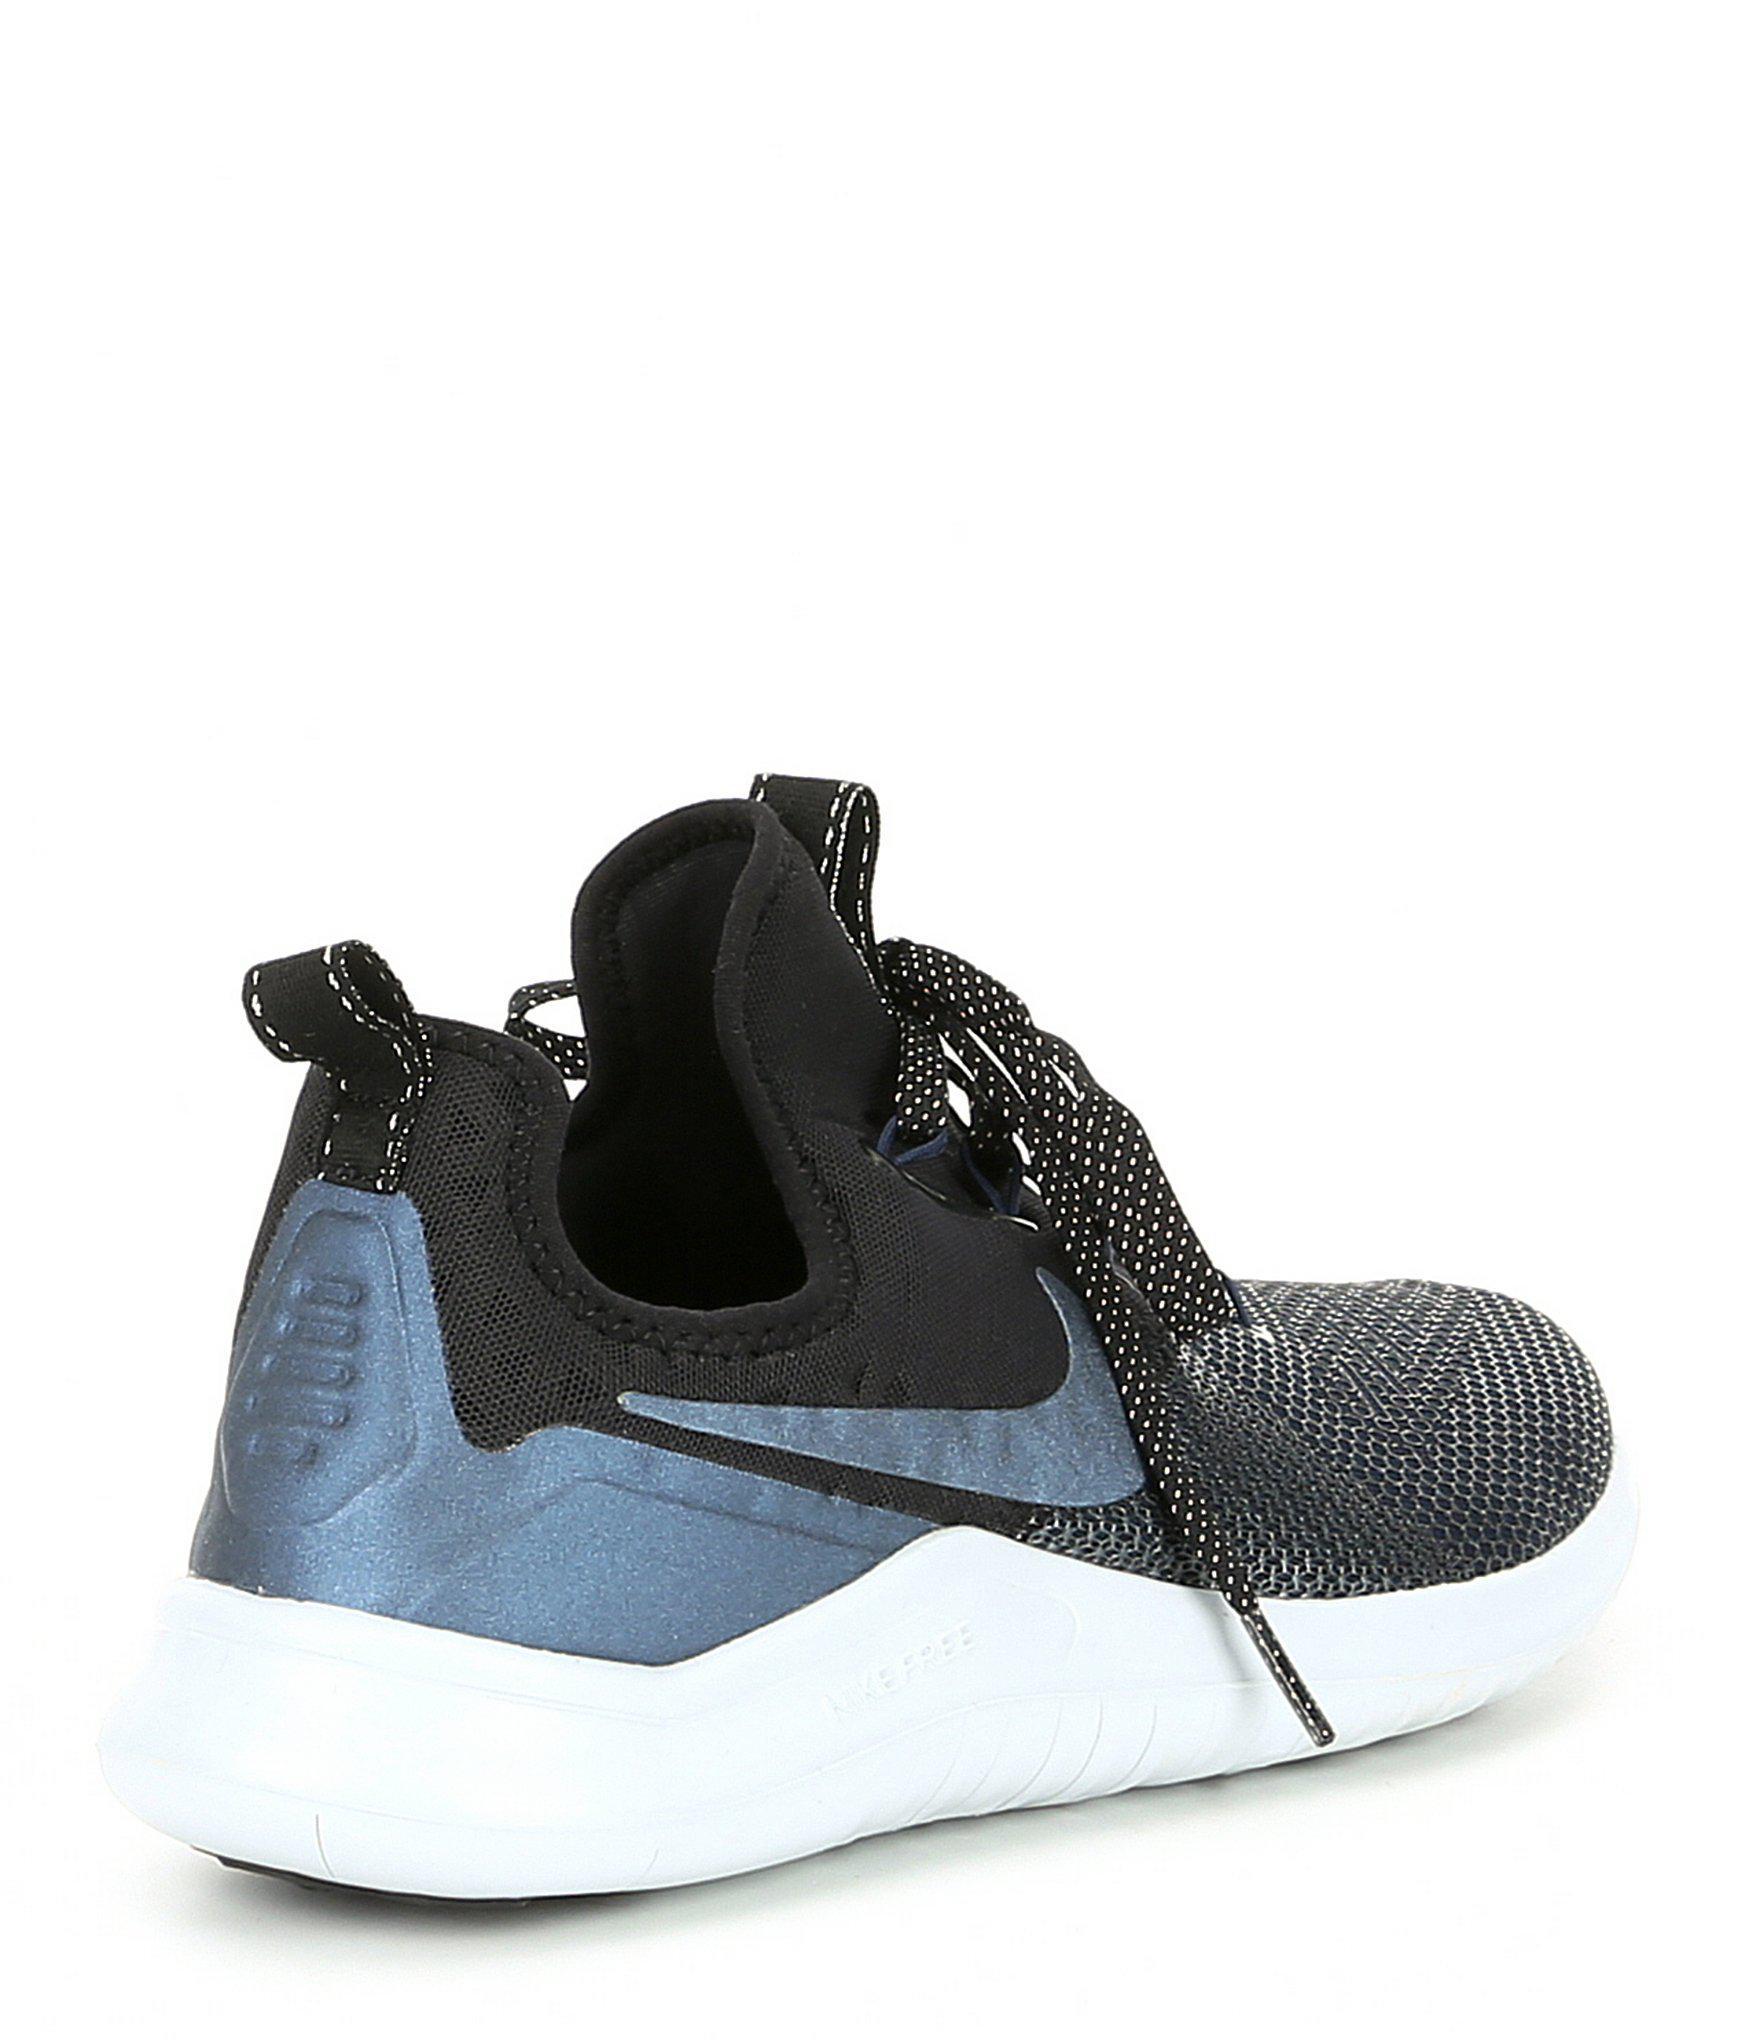 b2cc526ddb89 Lyst - Nike Women s Free Tr 8 Metallic Training Shoe in Black